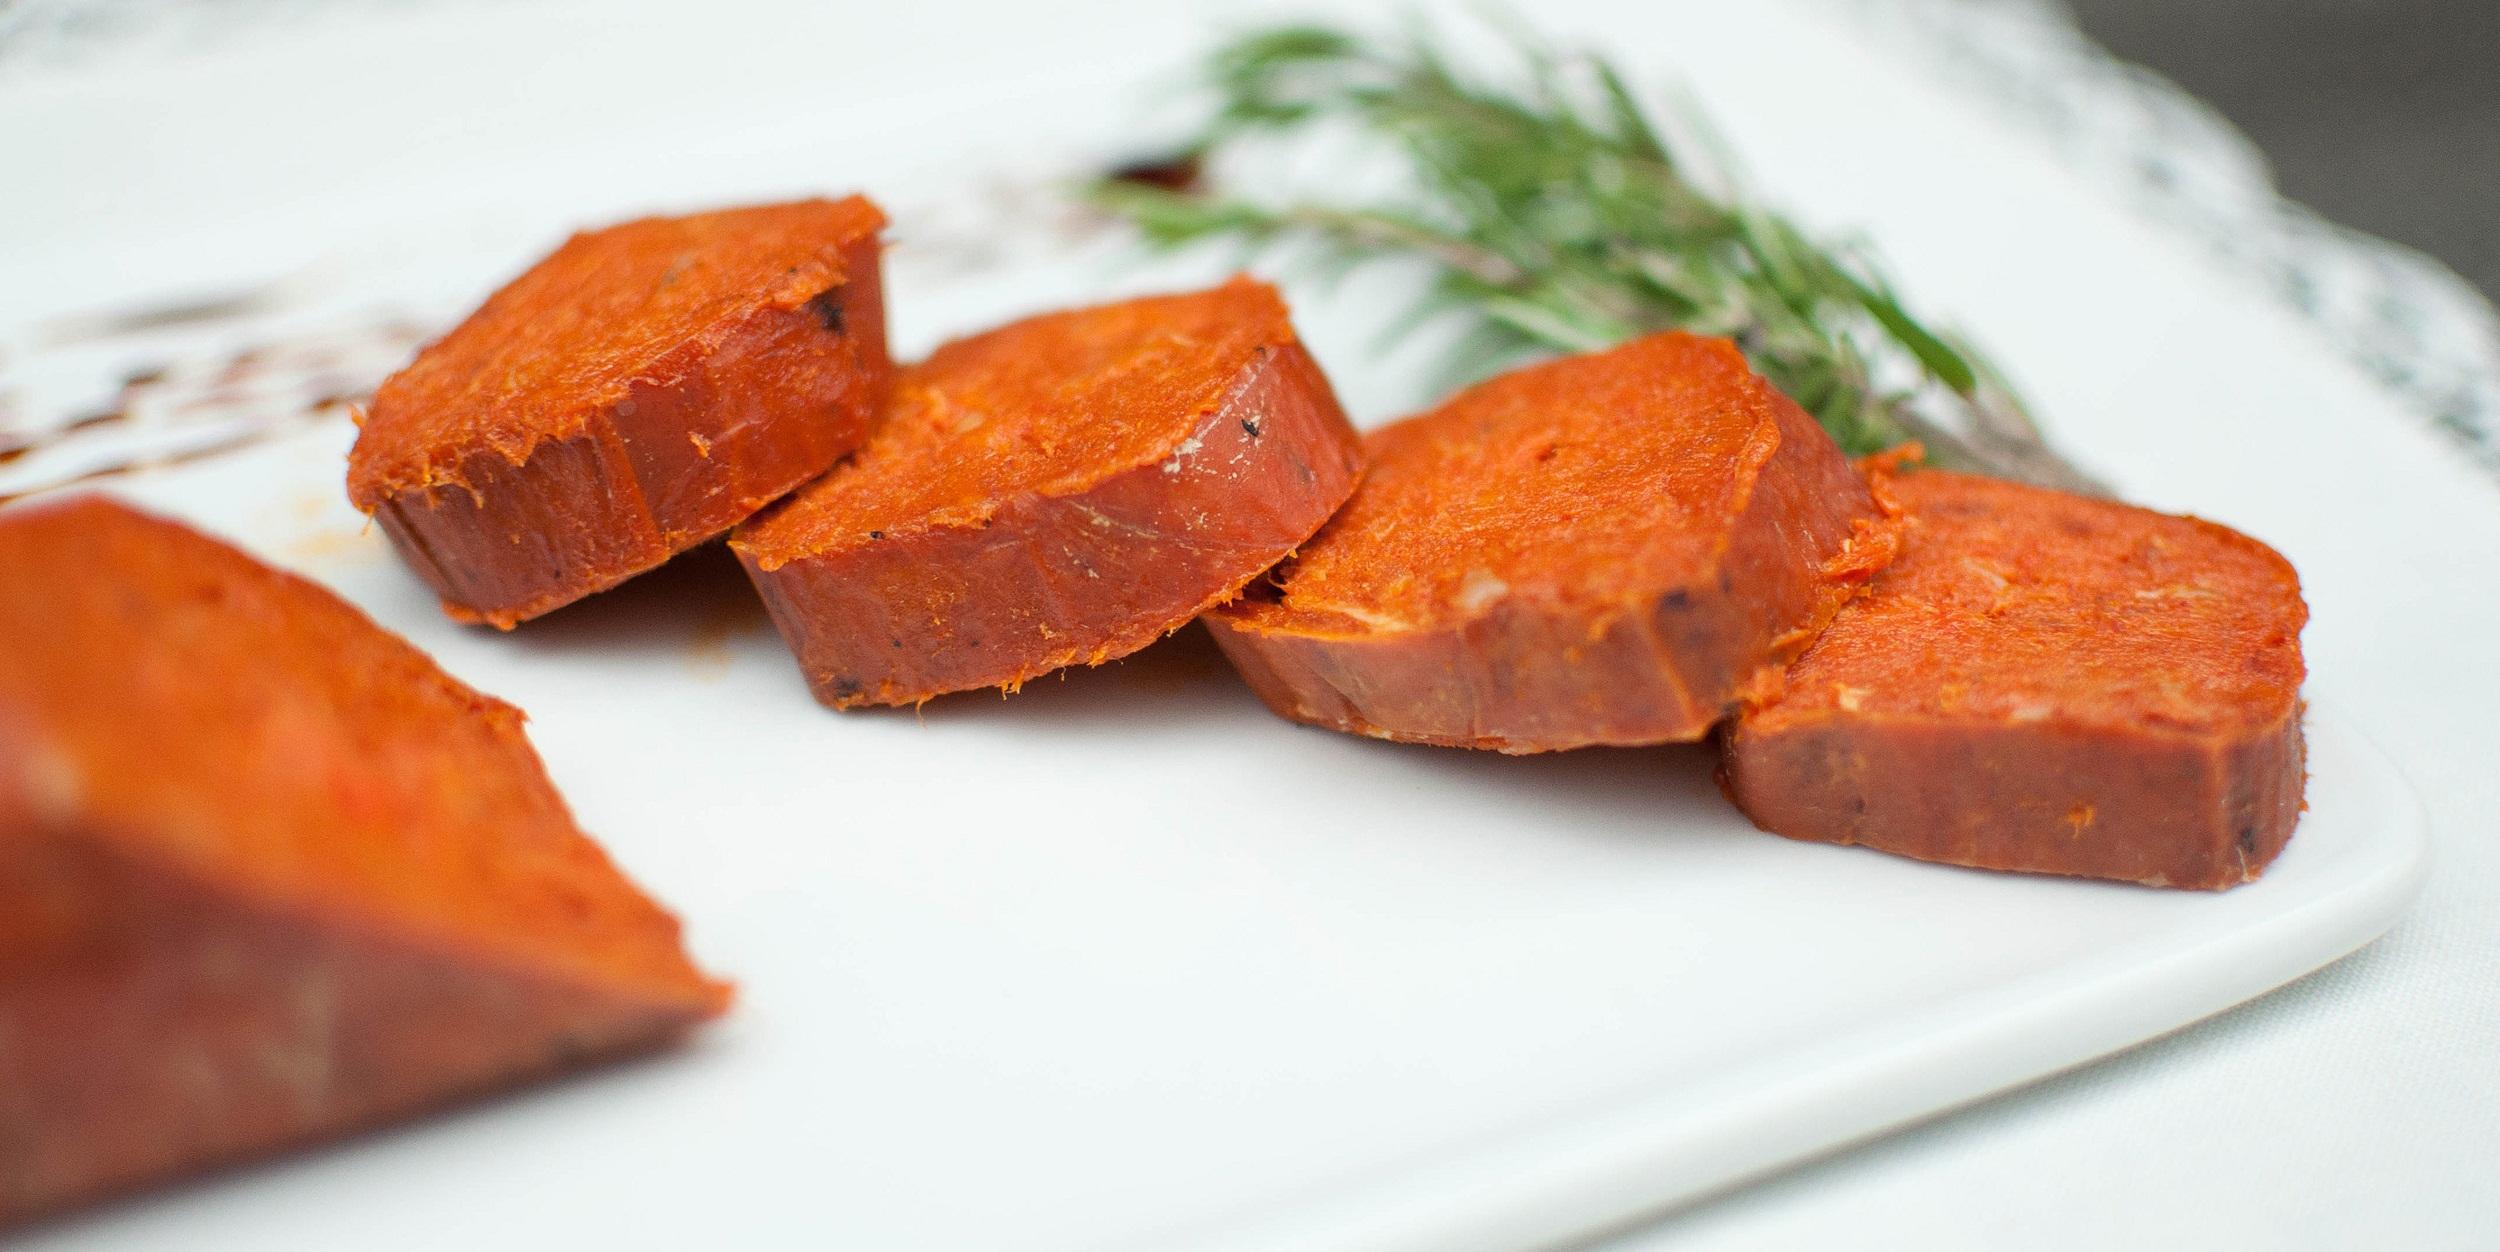 Испанская колбаса – собрасада